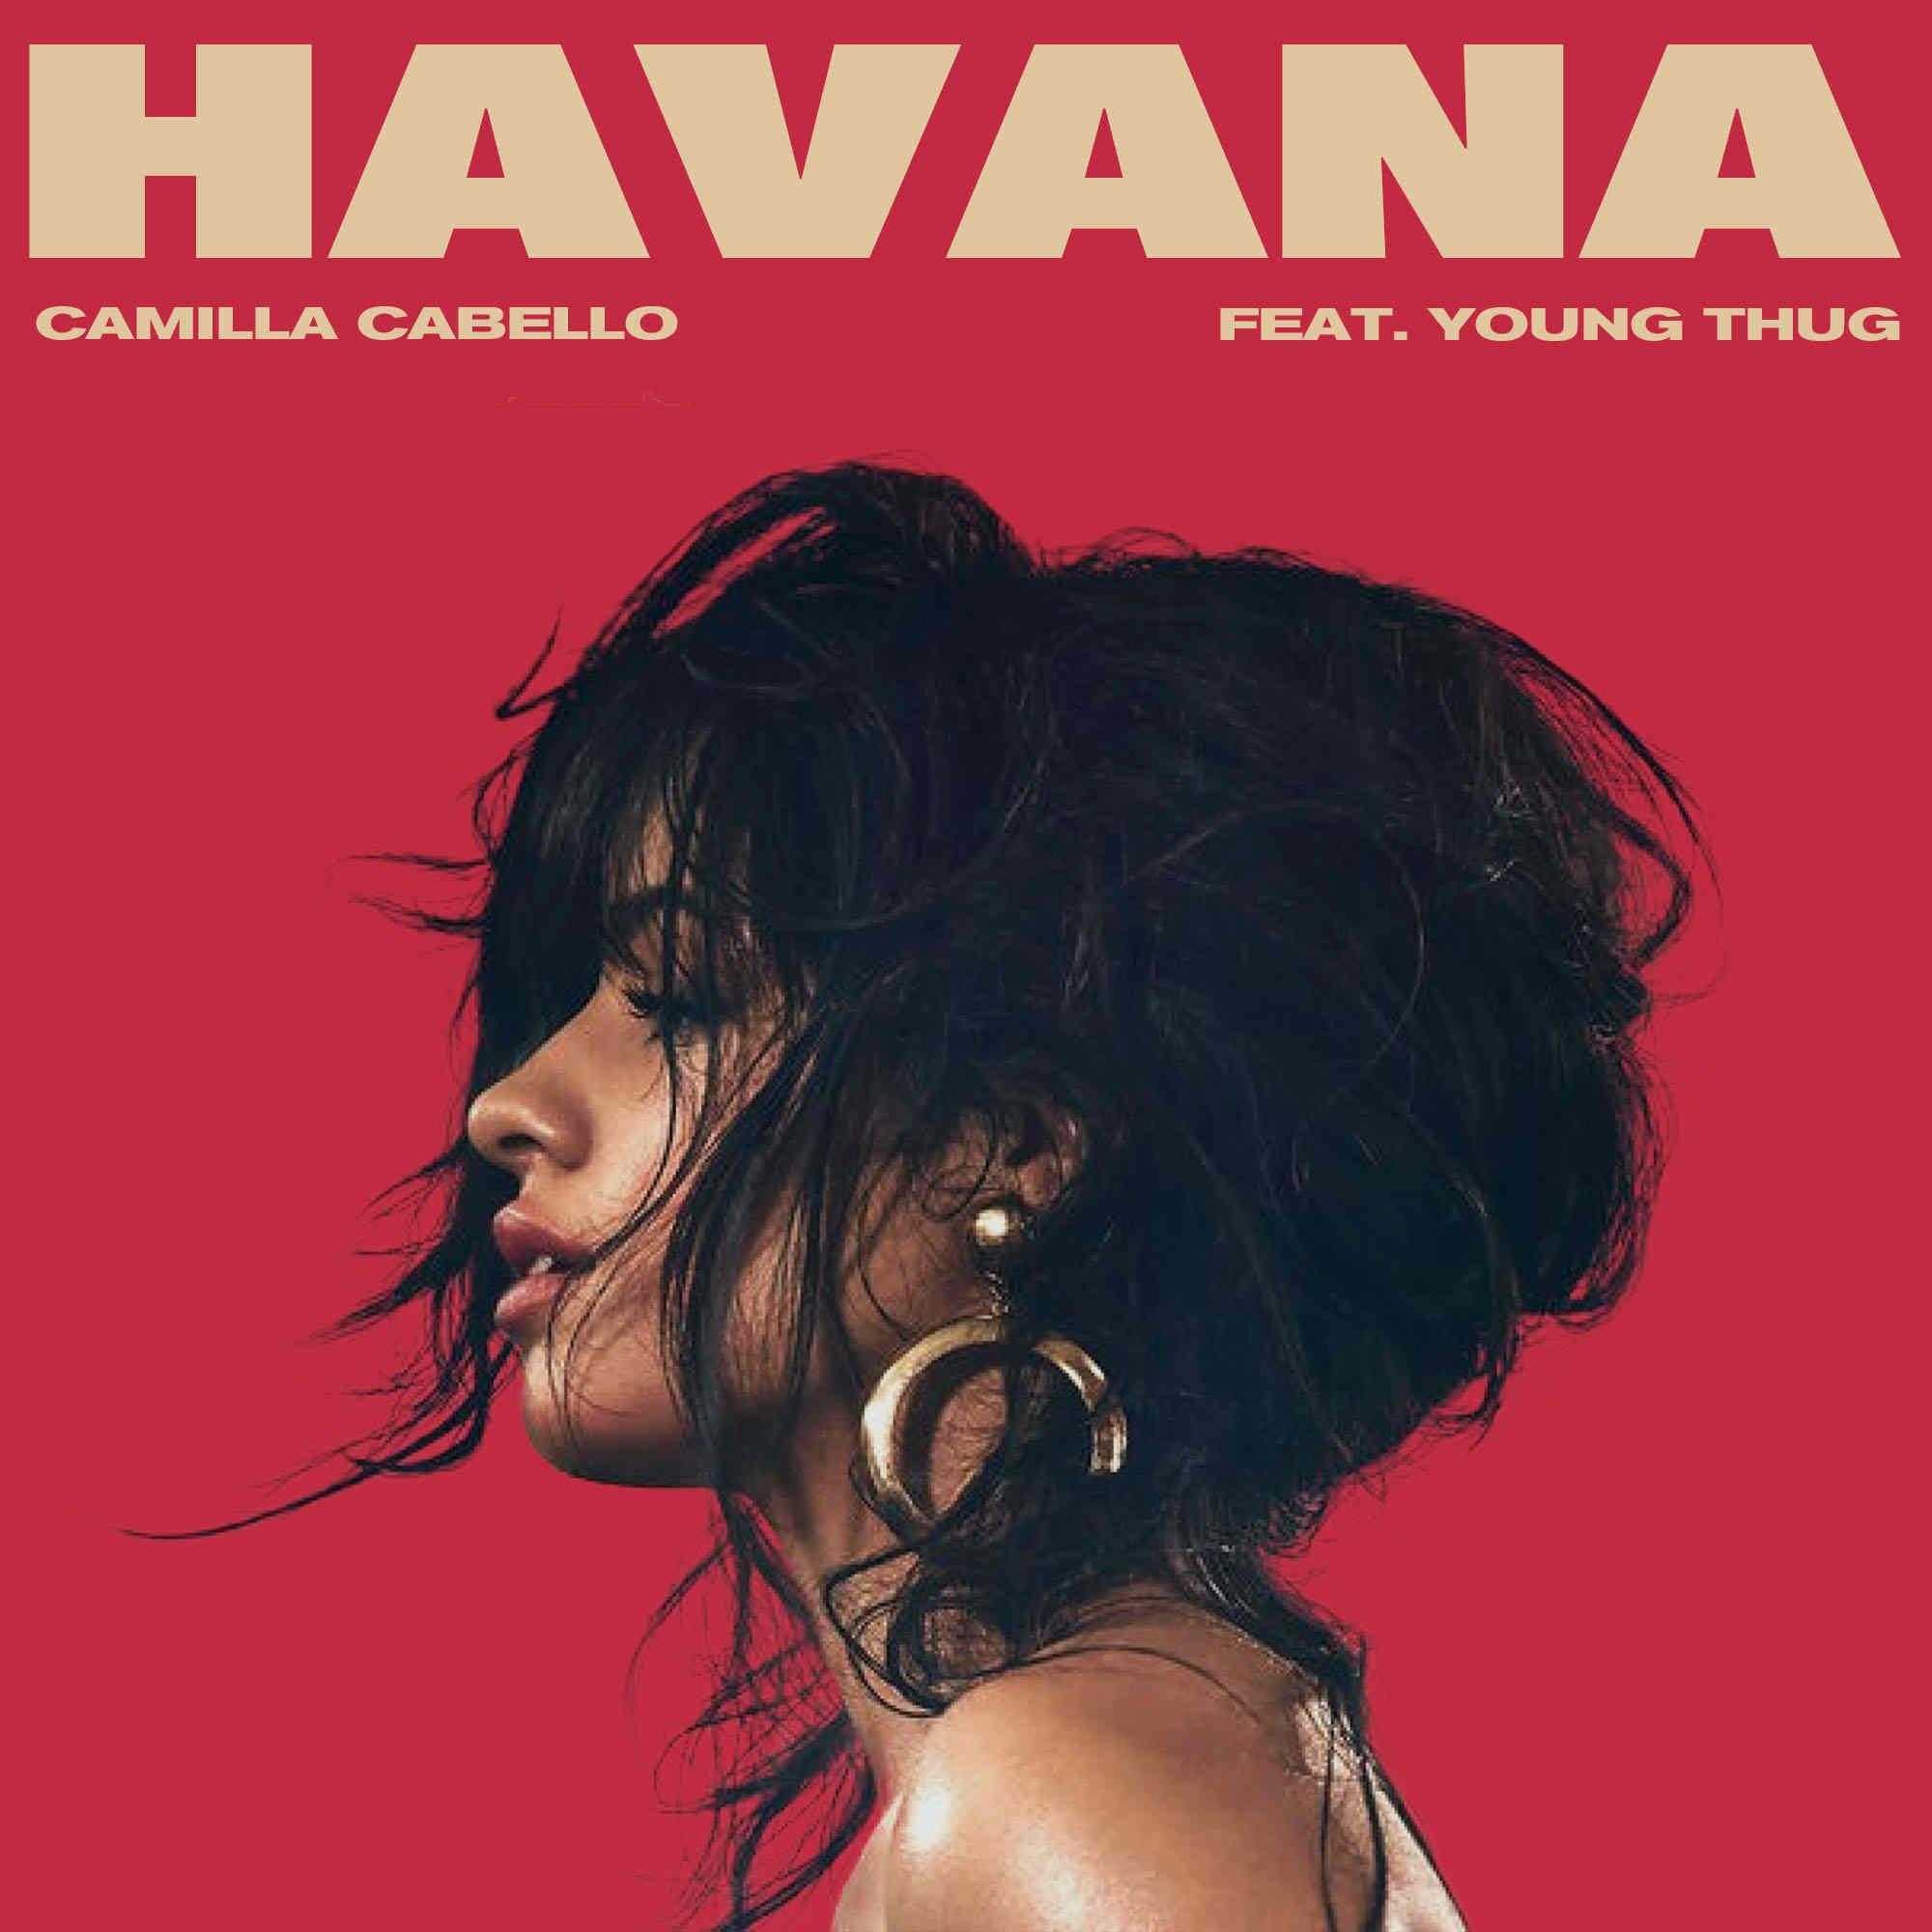 Album cover Havana Camila Cabello PSD